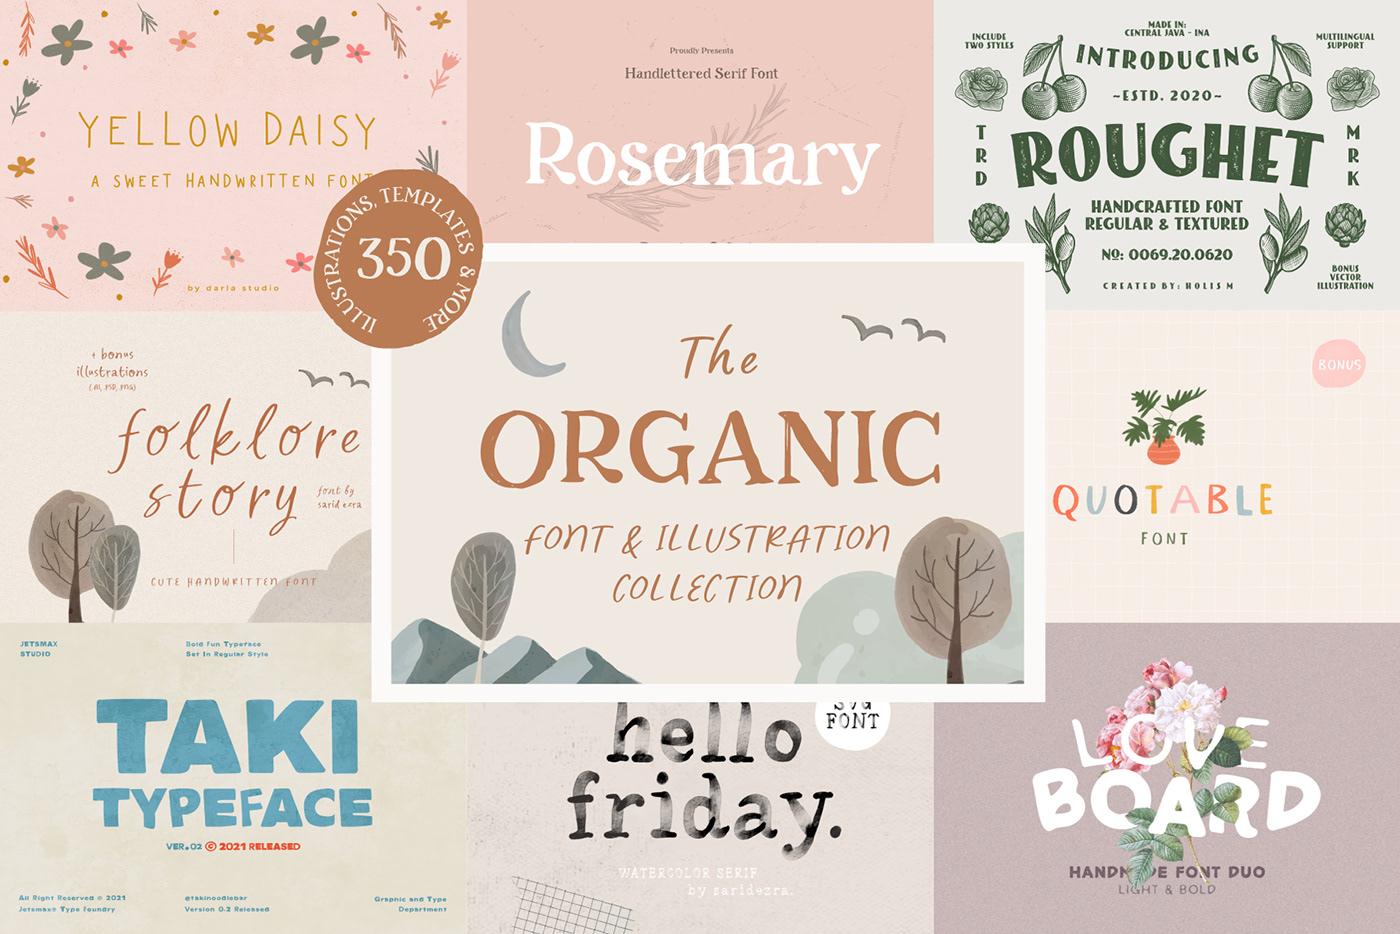 brand identity branding  floral fonts hand drawn handwritten illustrations organic Typeface typography